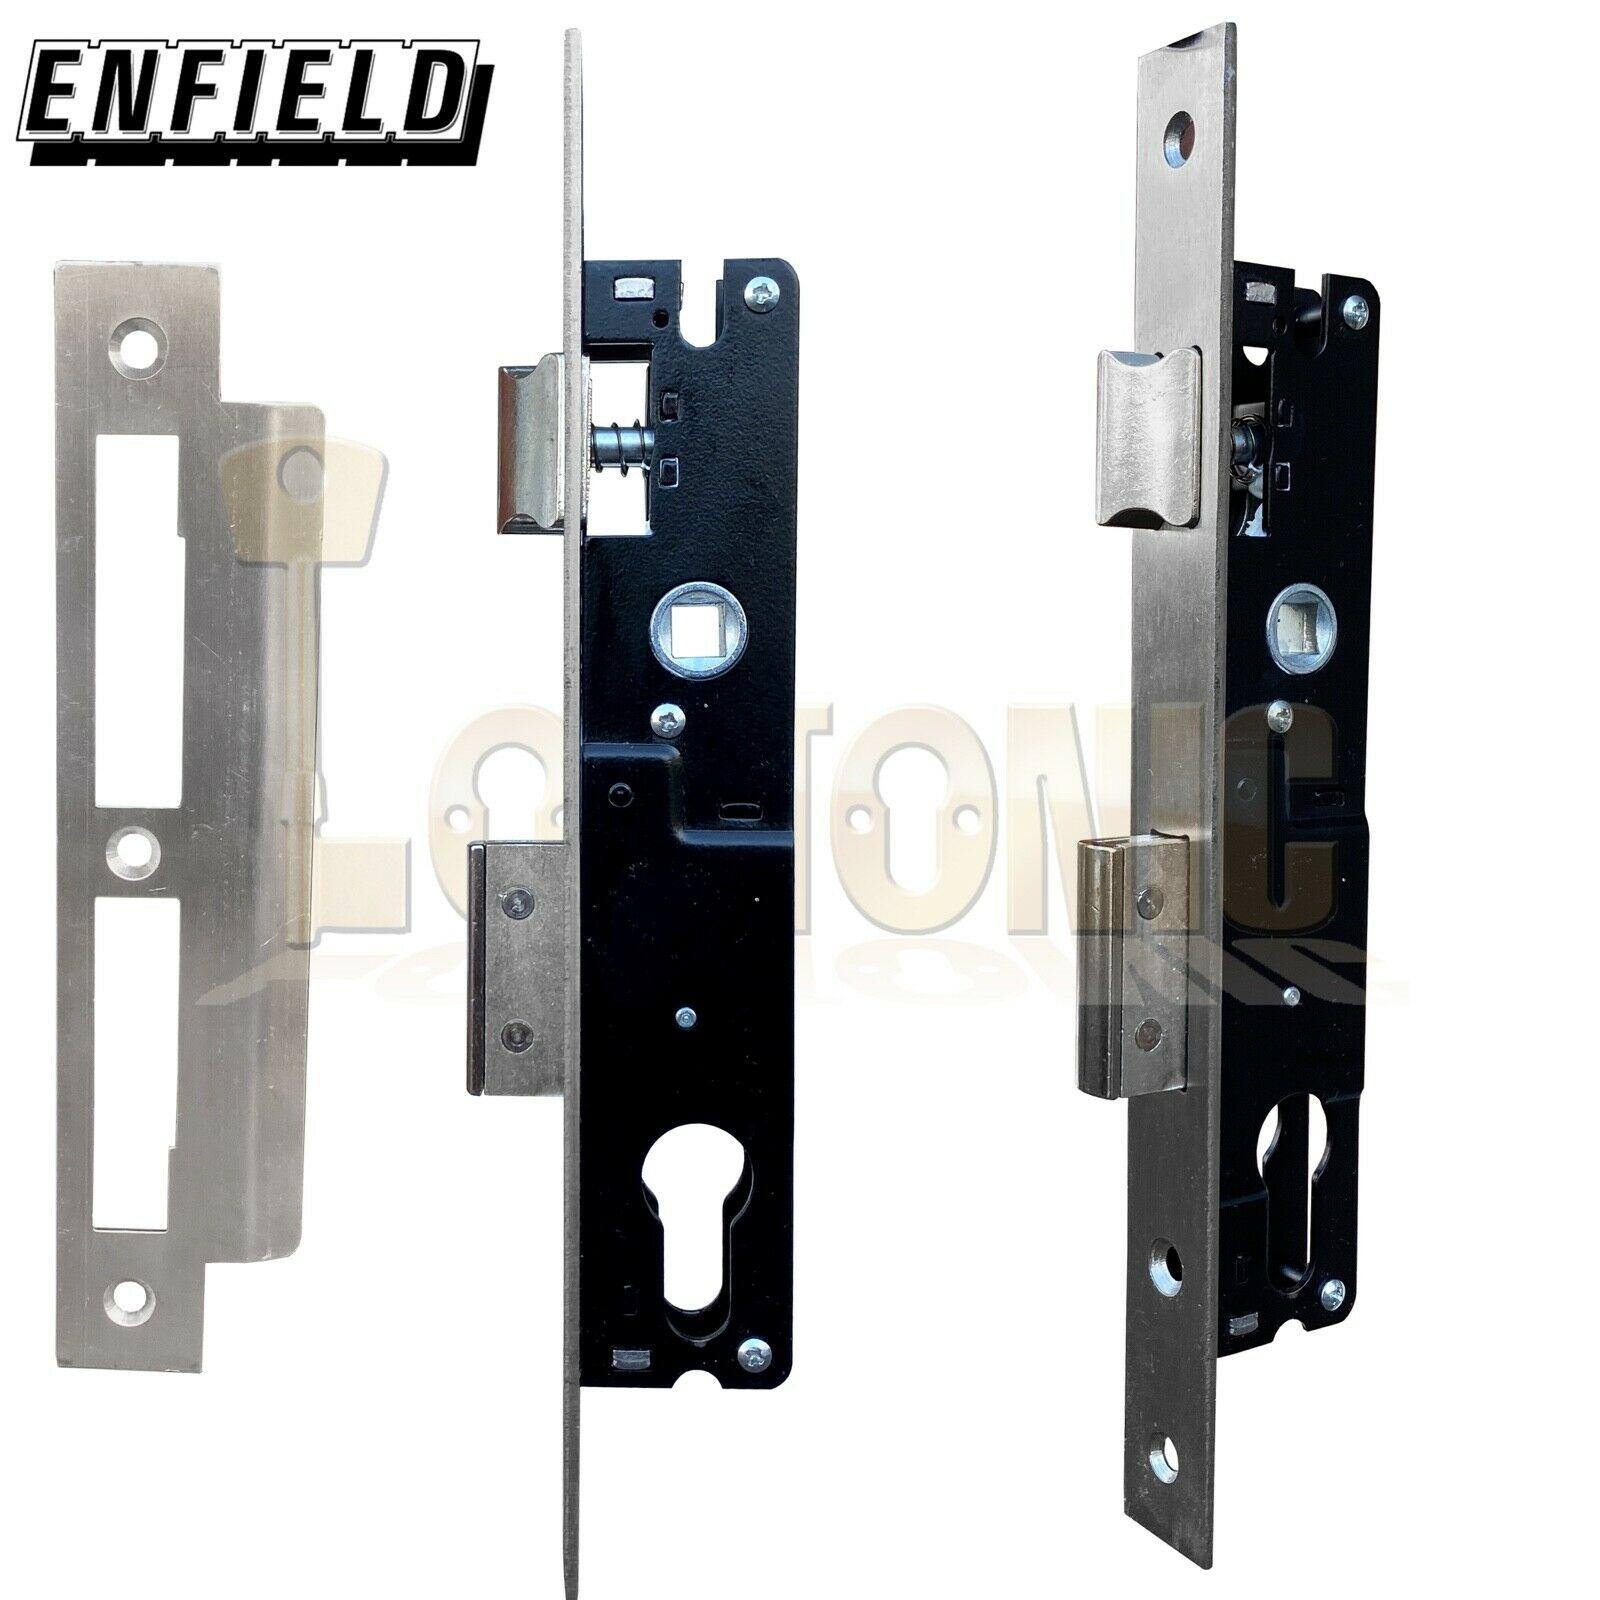 Enfield 20mm Backset Narrow Stile Shed Gate Garage Mortice Euro Sash lock case